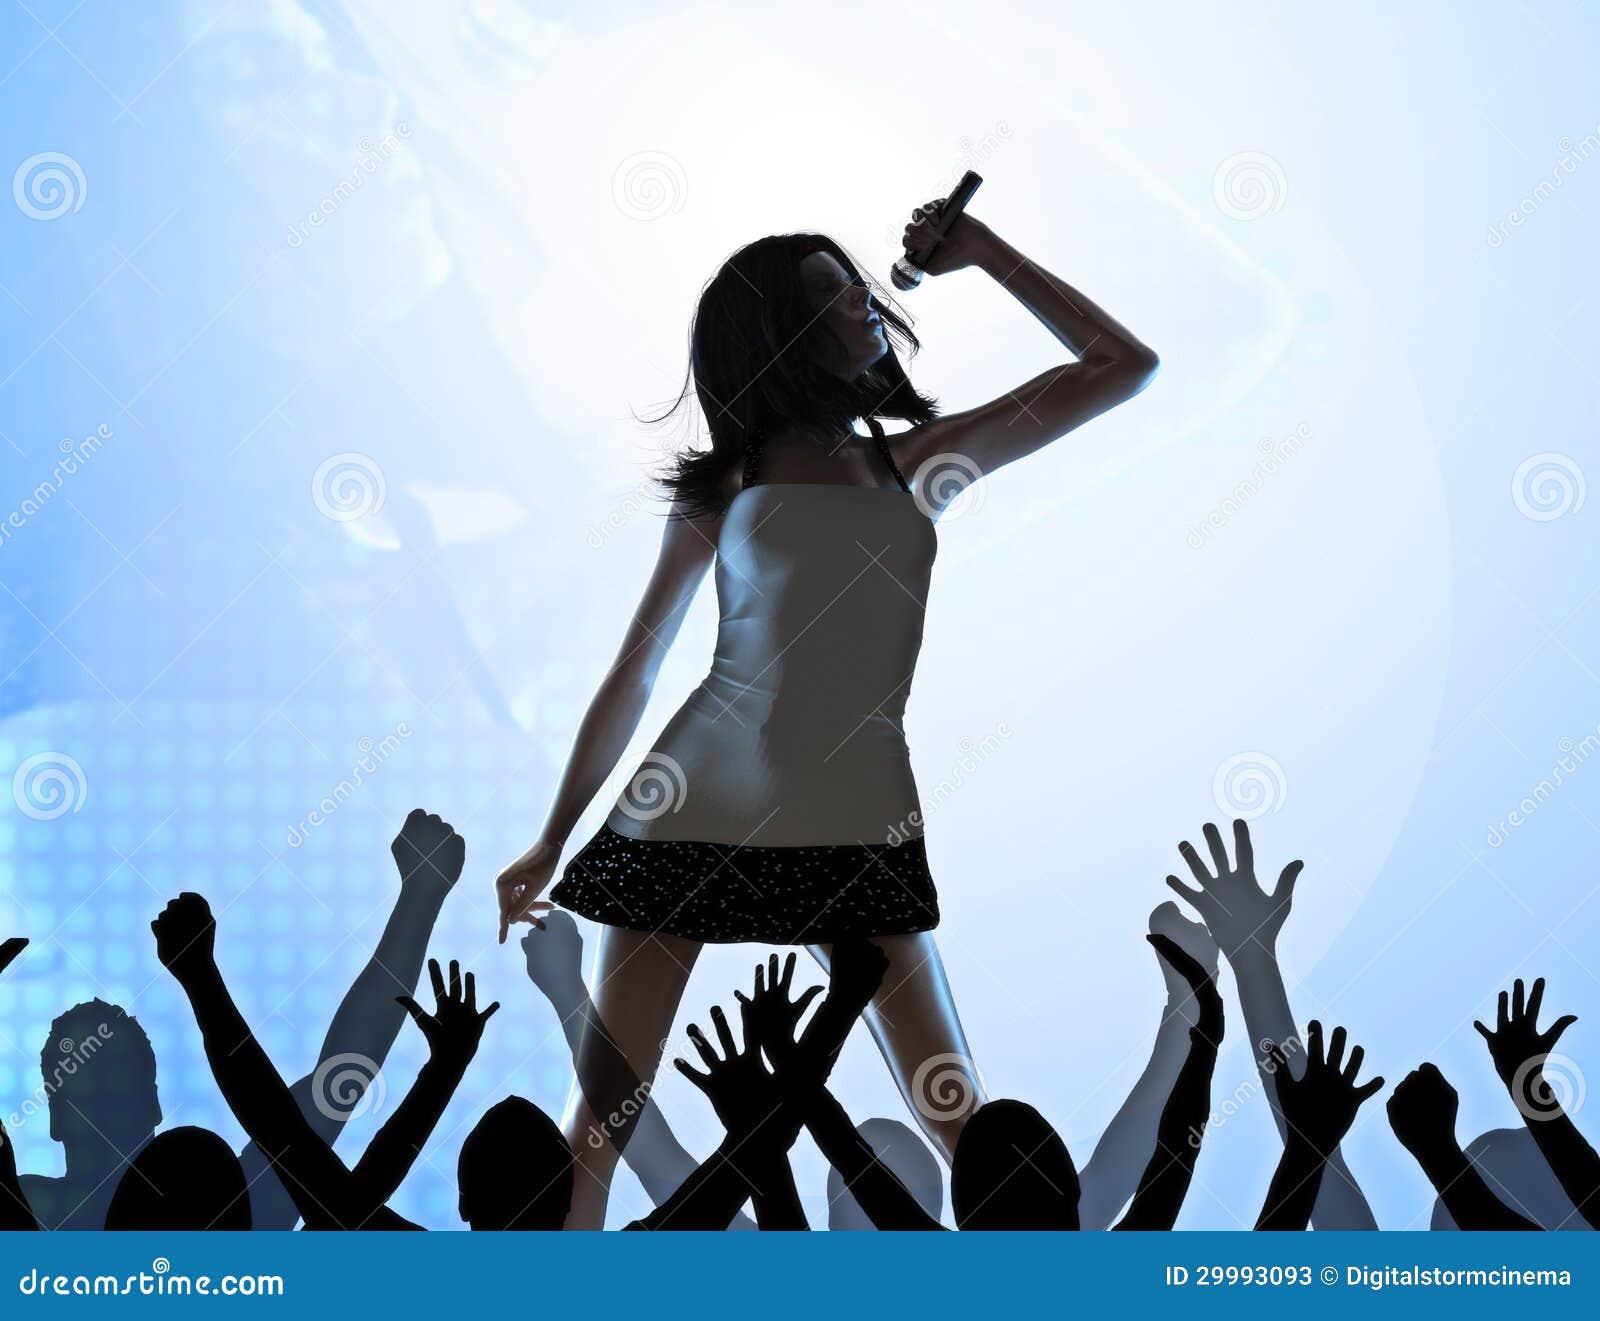 Female Singer On Stage Stock Photos - Image: 29993093